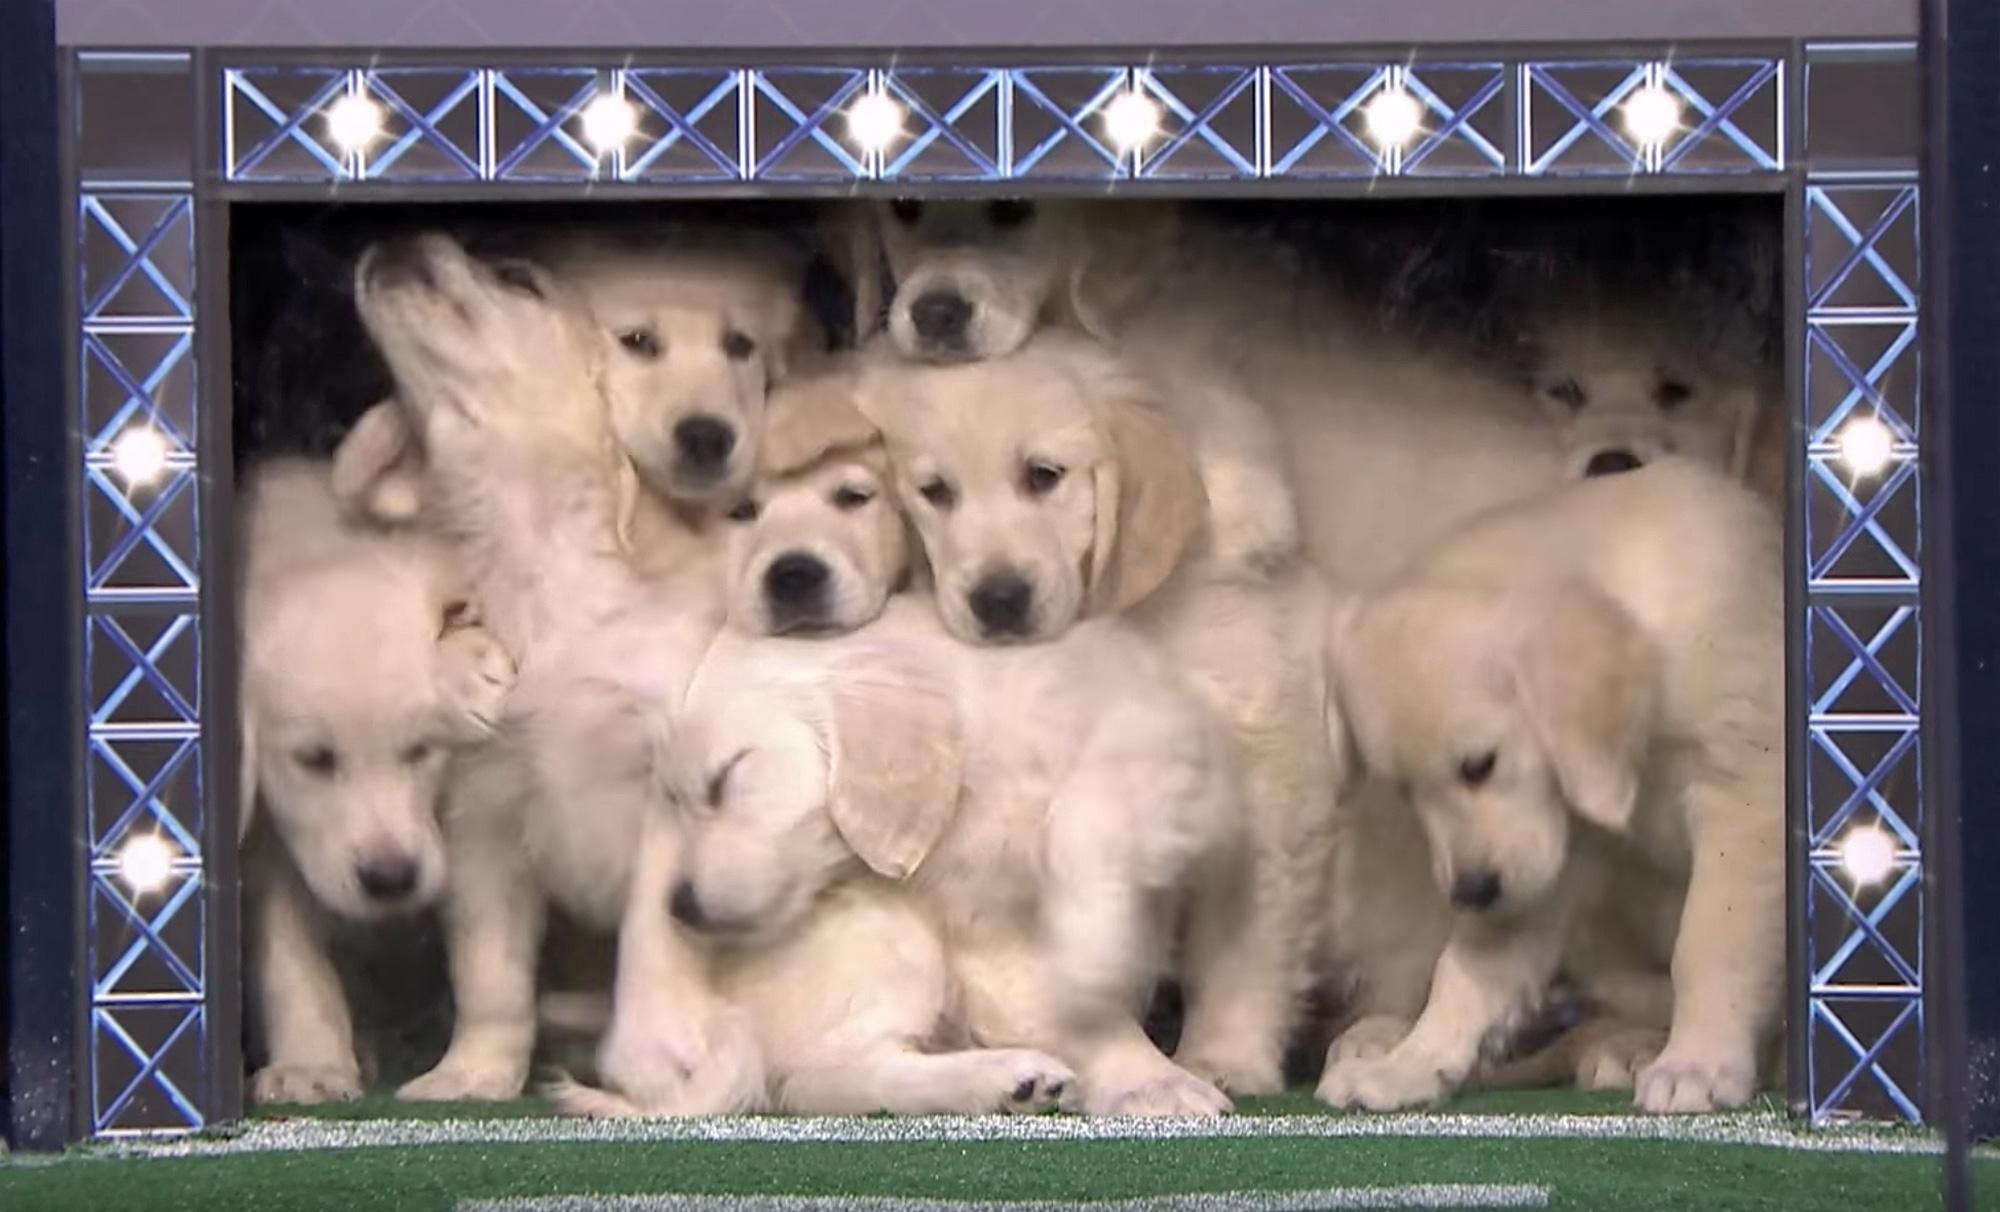 Jimmy Fallon Super Bowl puppies